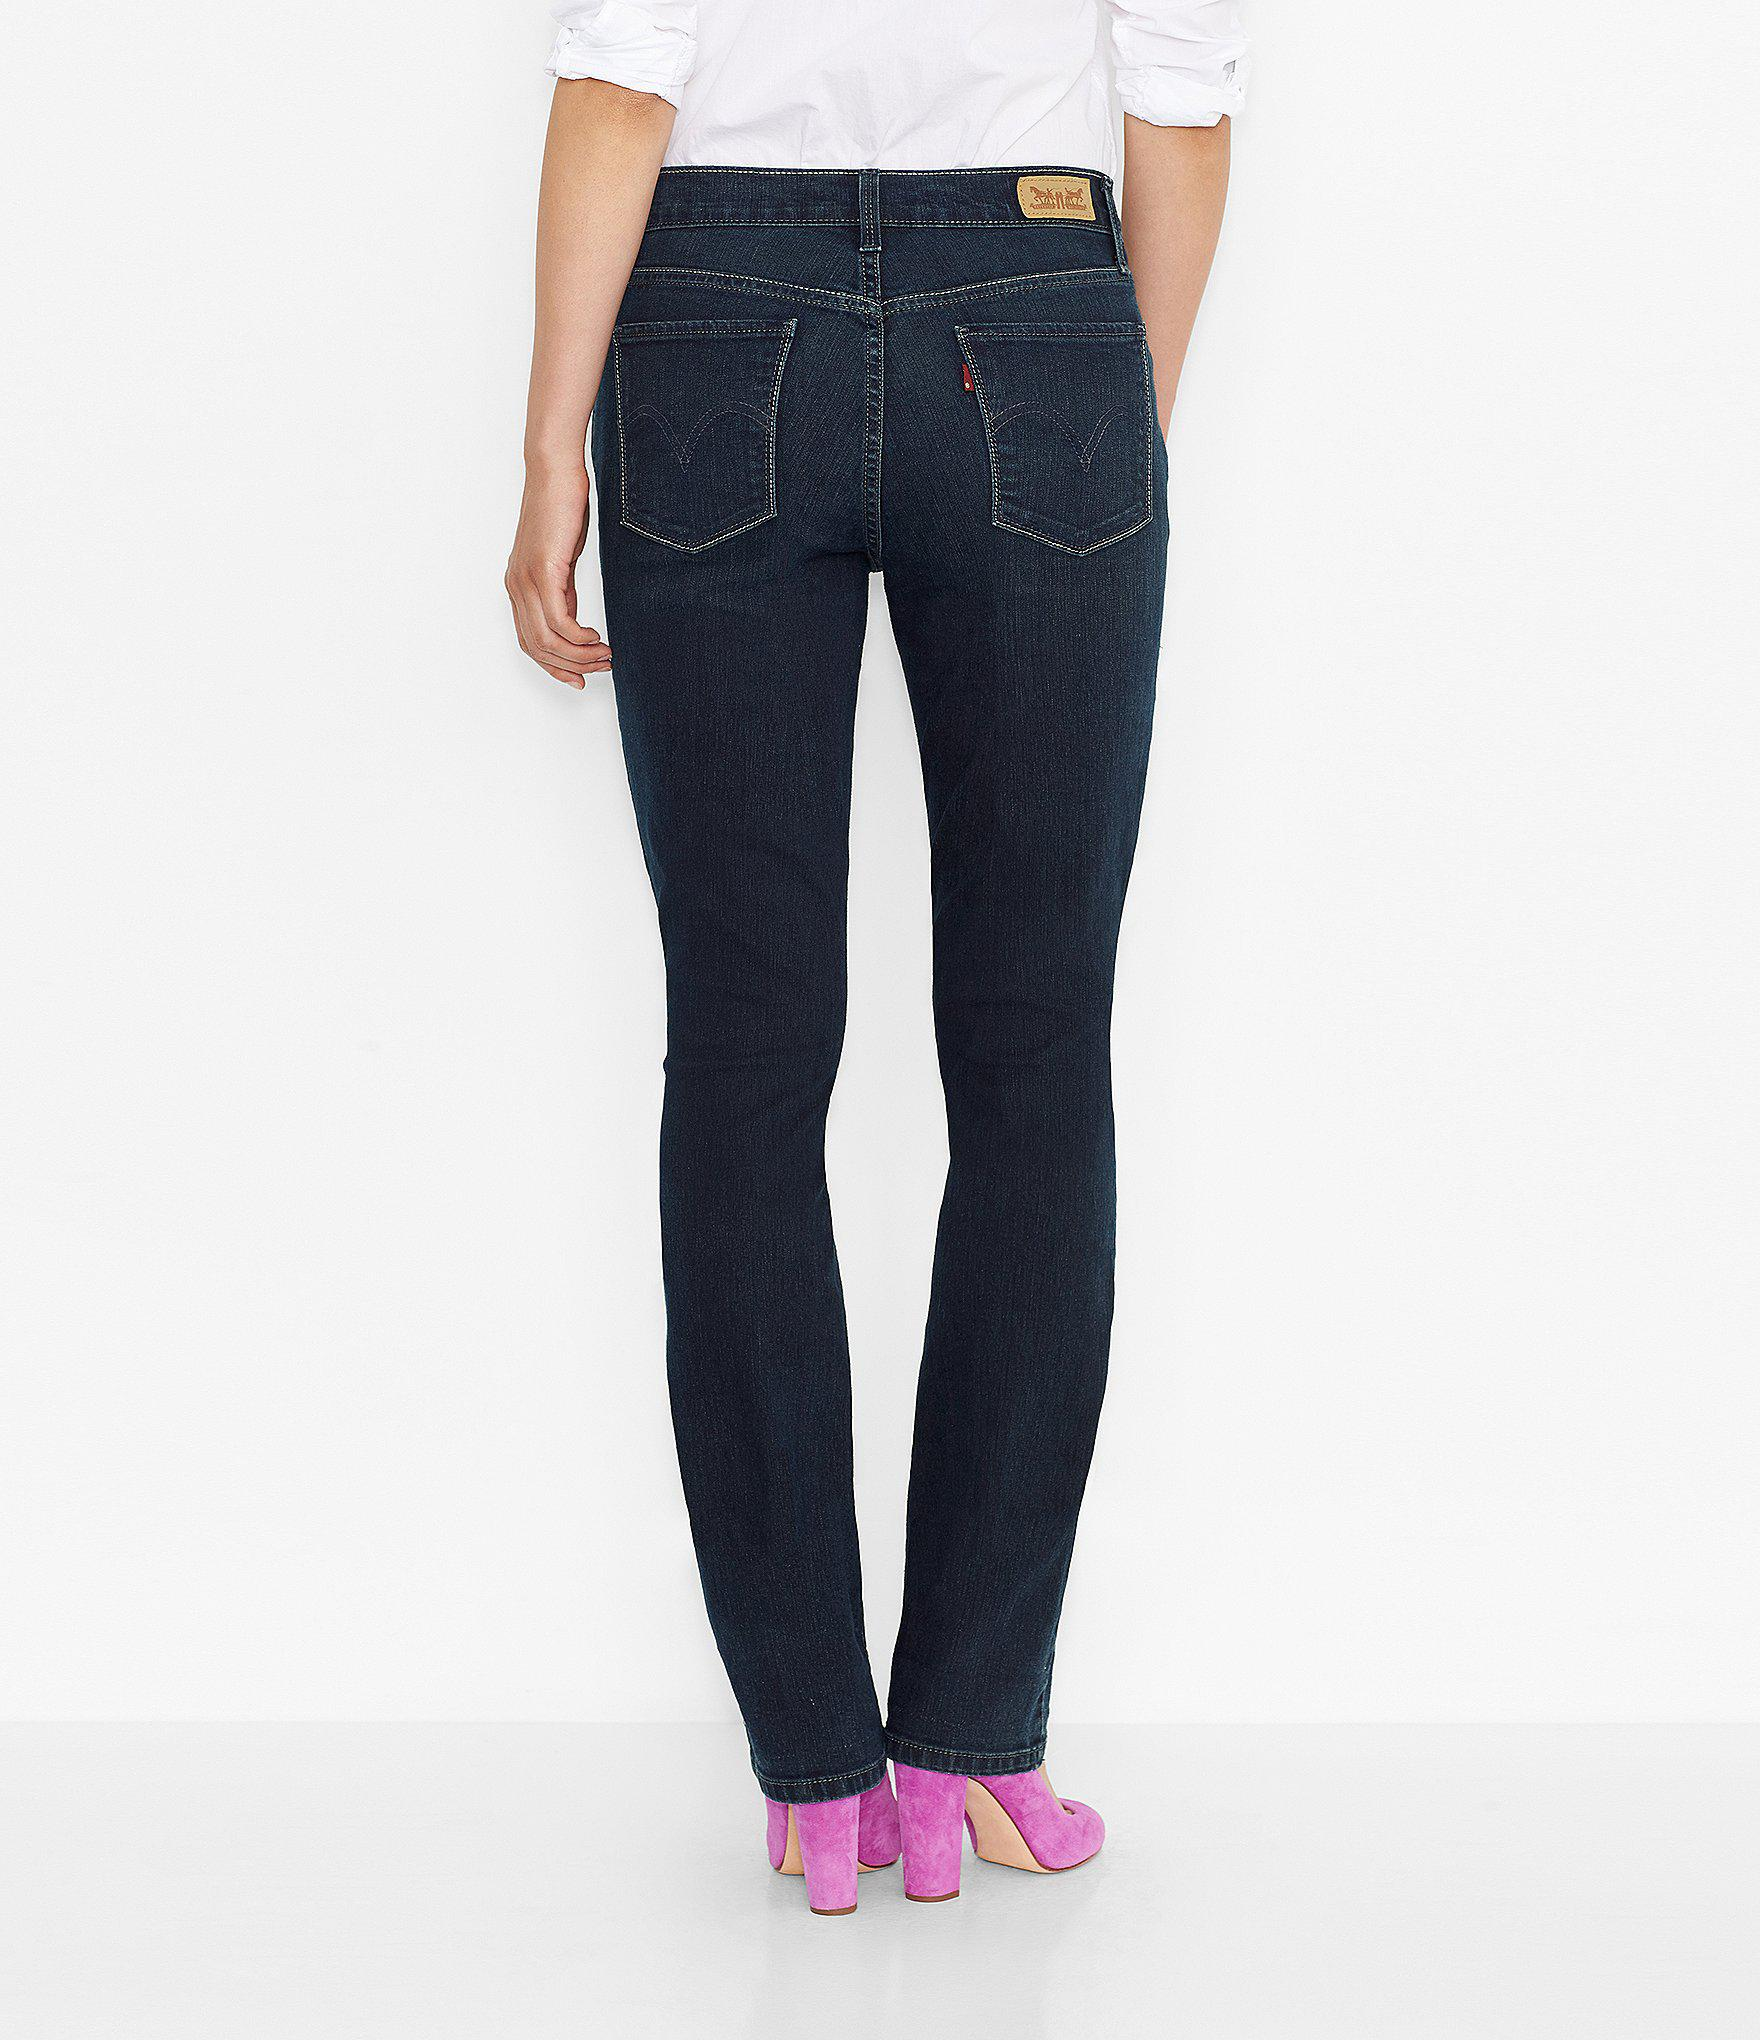 c2fb6df738c Lyst - Levi s Levi ́s® 505tm Straight-leg Jeans in Blue